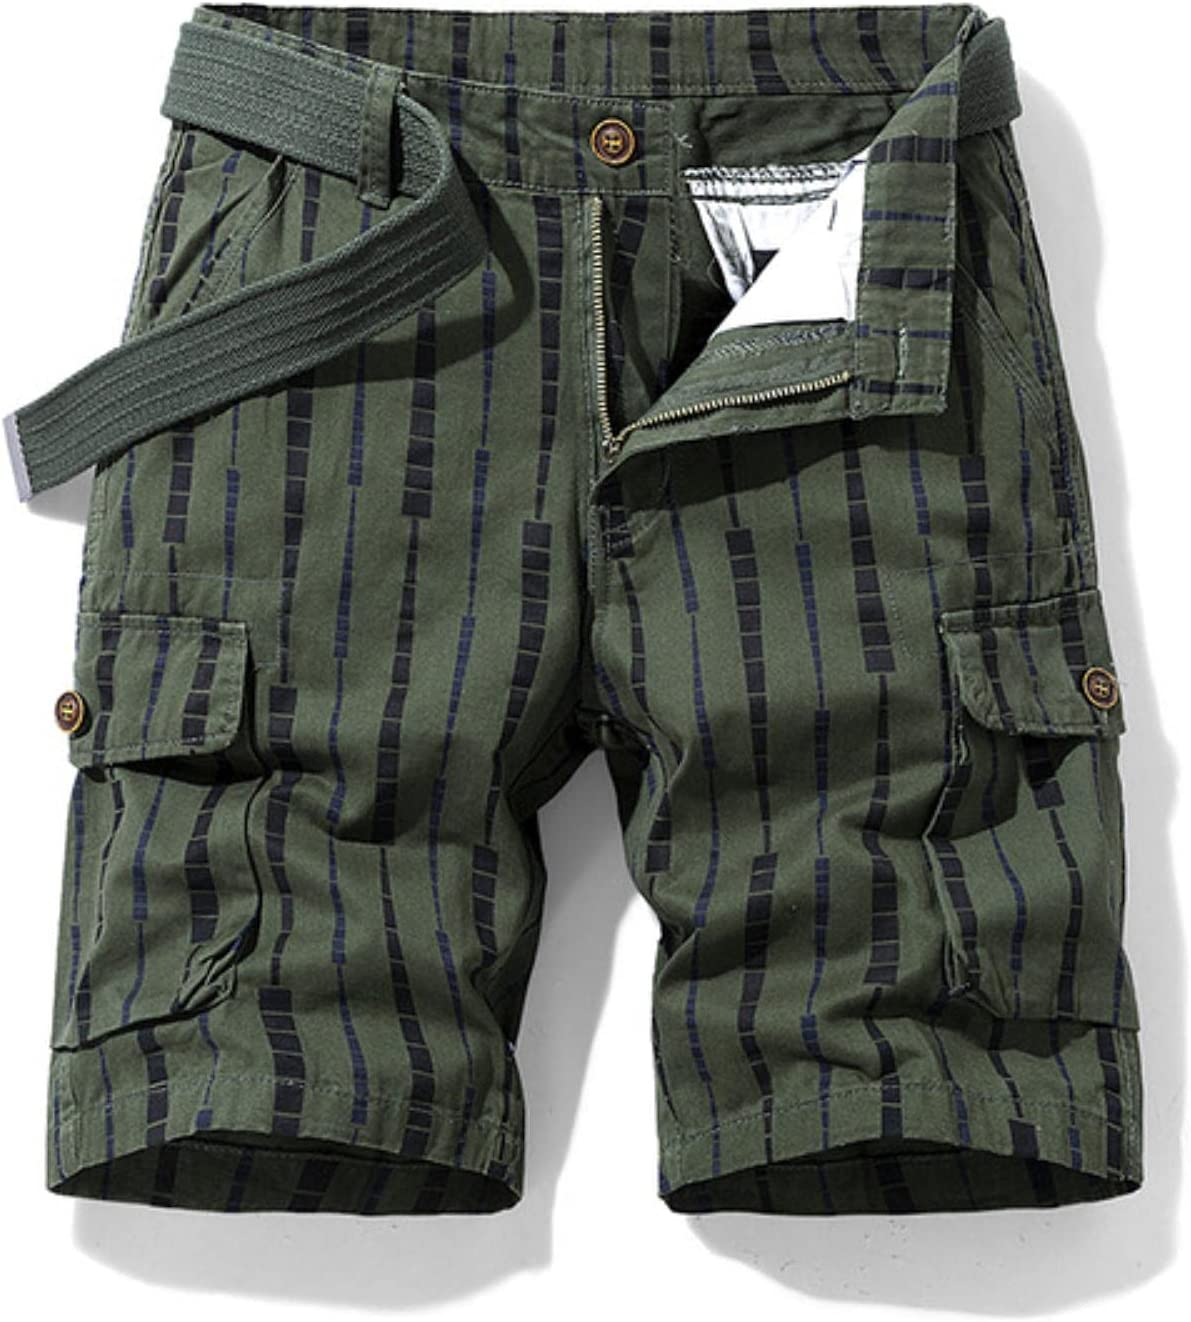 WoJogom 2021 Spring Men Cotton Print Men's Shorts Clothing Summer Casual Breeches Bermuda Fashion Jeans for Beach Pants Men Short